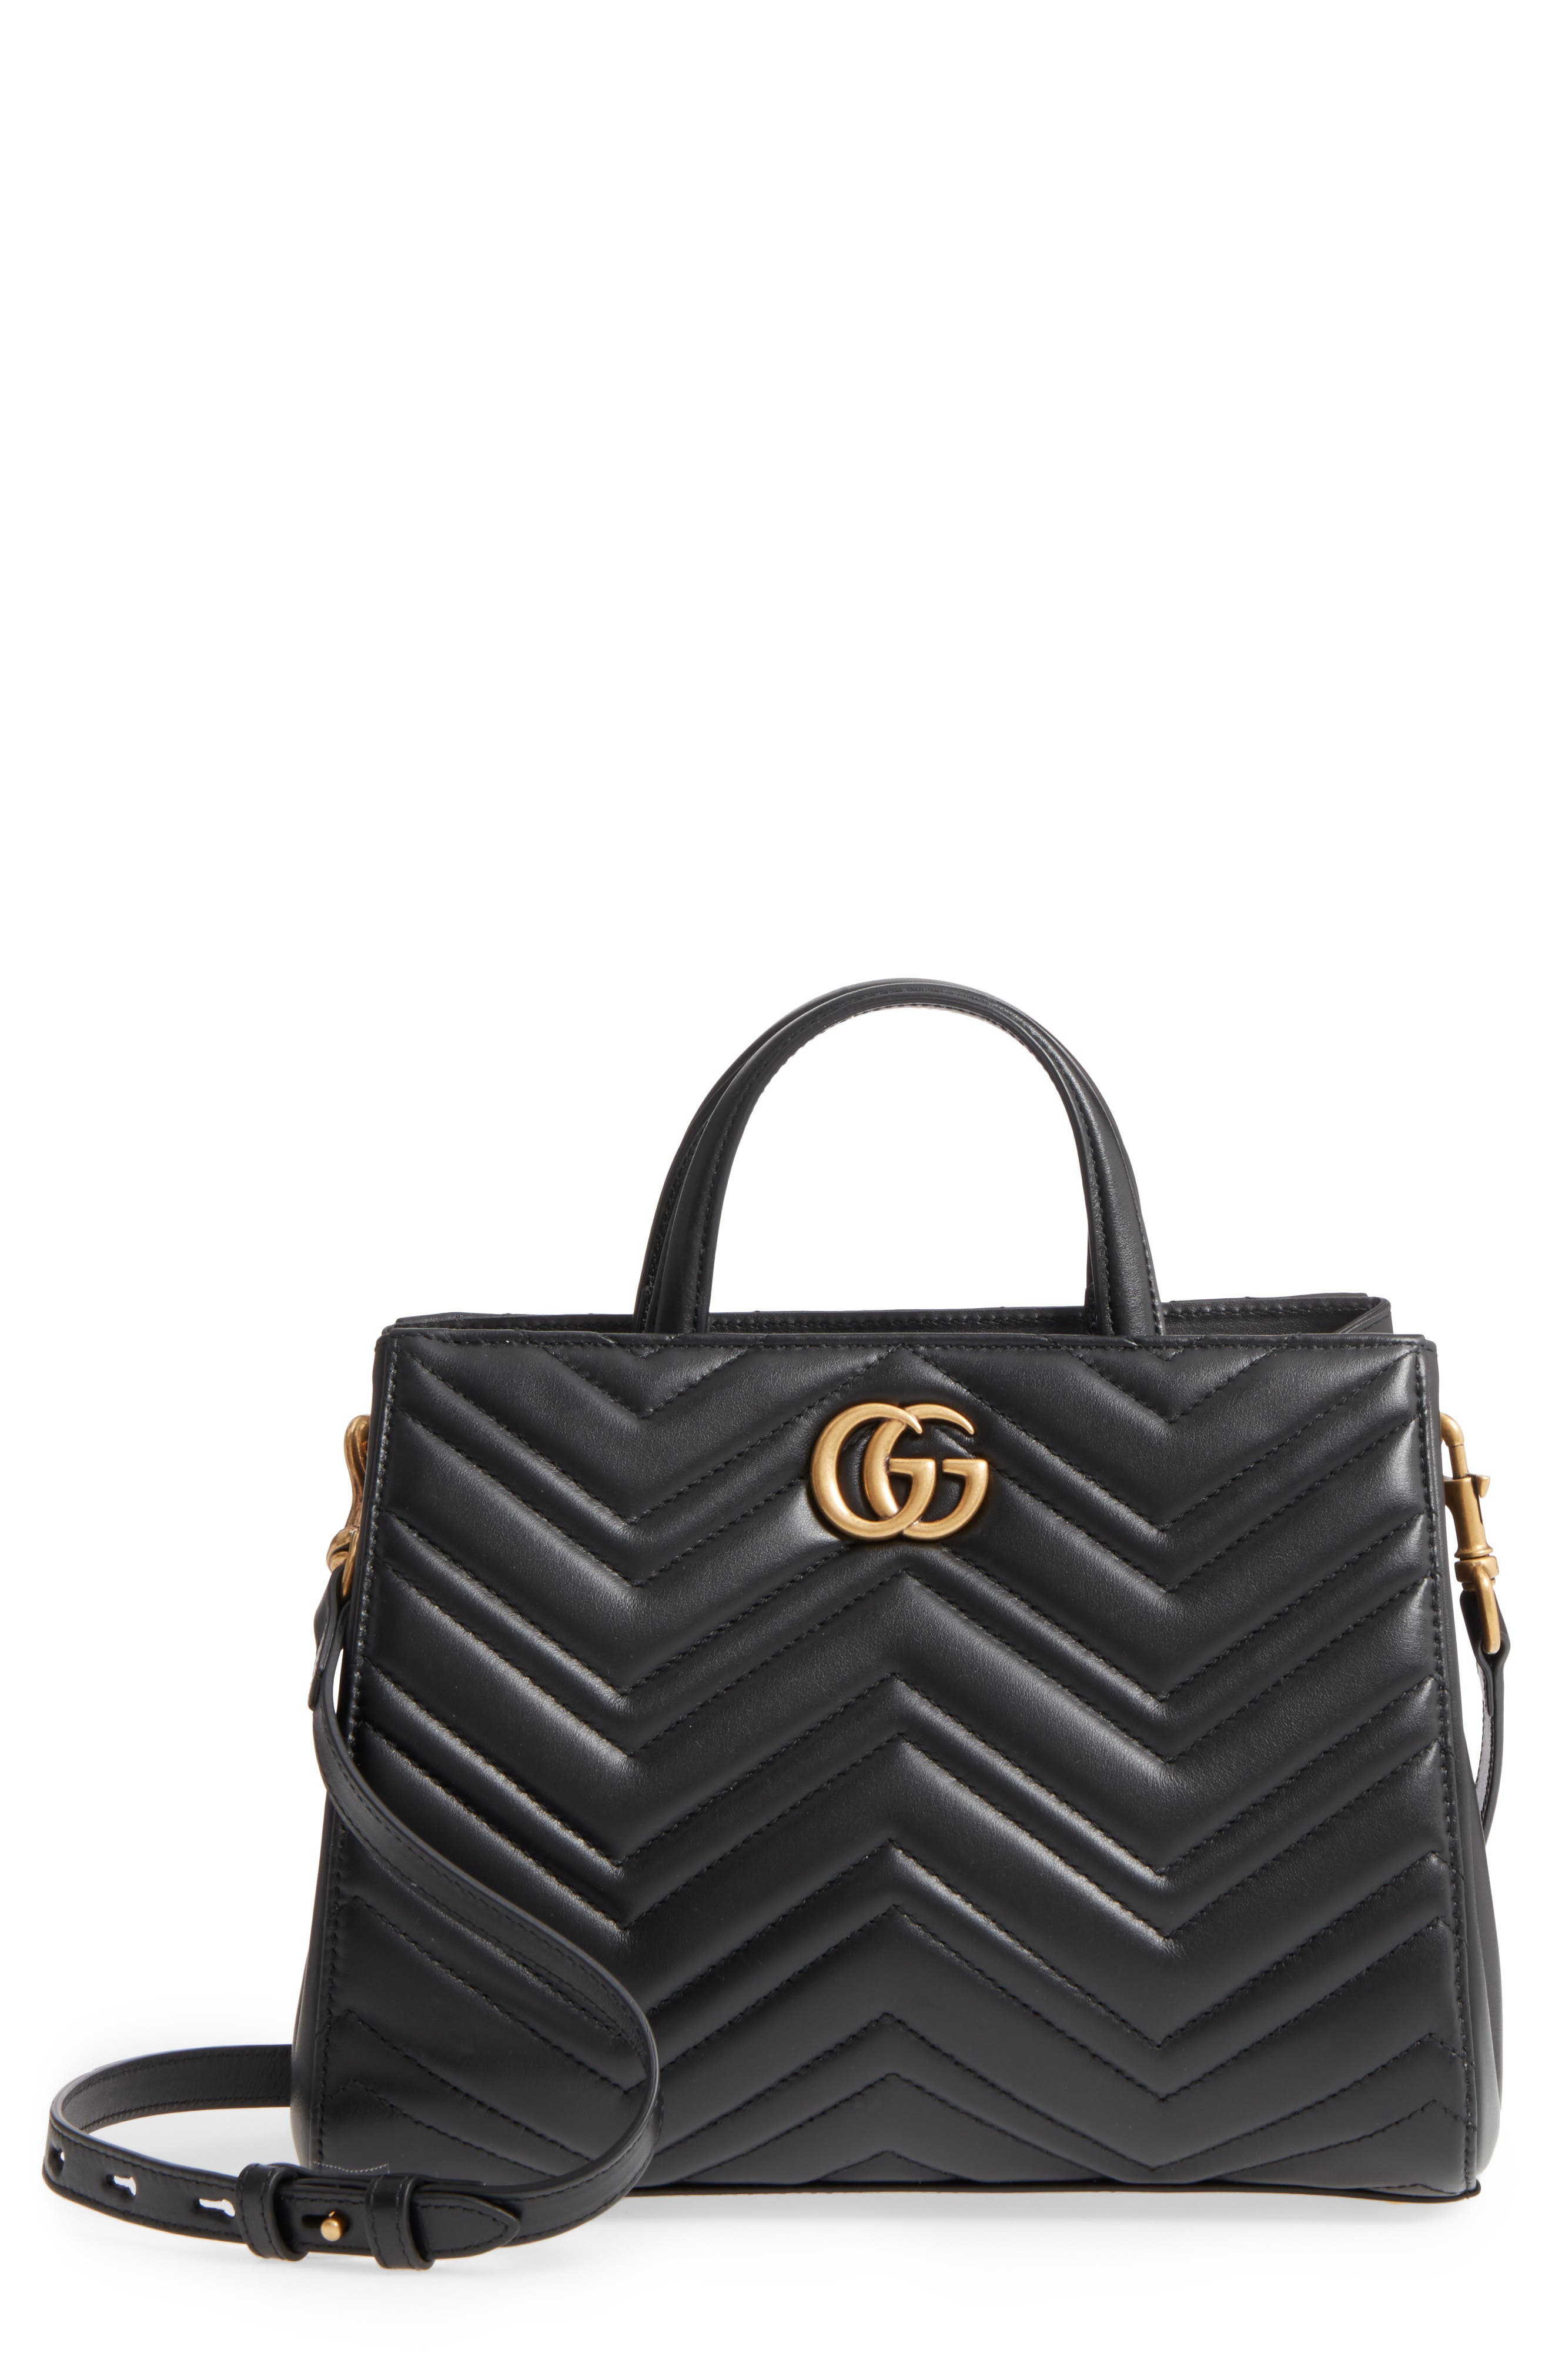 GG Small Marmont 2.0 Matelassé Leather Top Handle Satchel,                         Main,                         color, Nero/ Nero